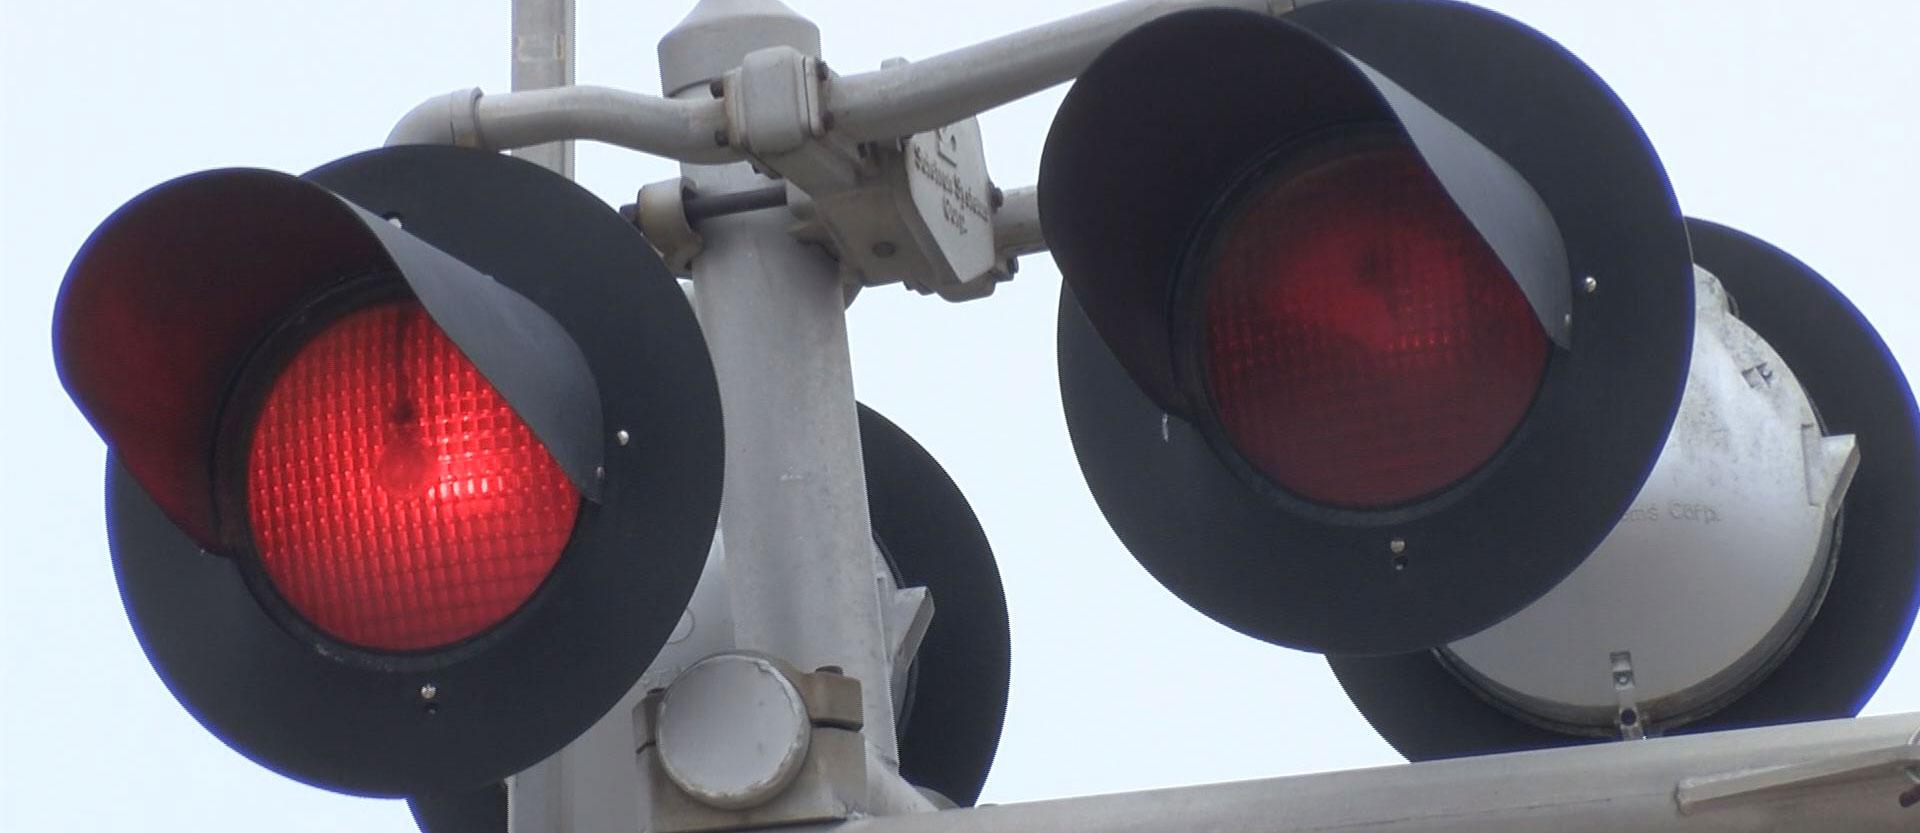 KELO railroad signal light